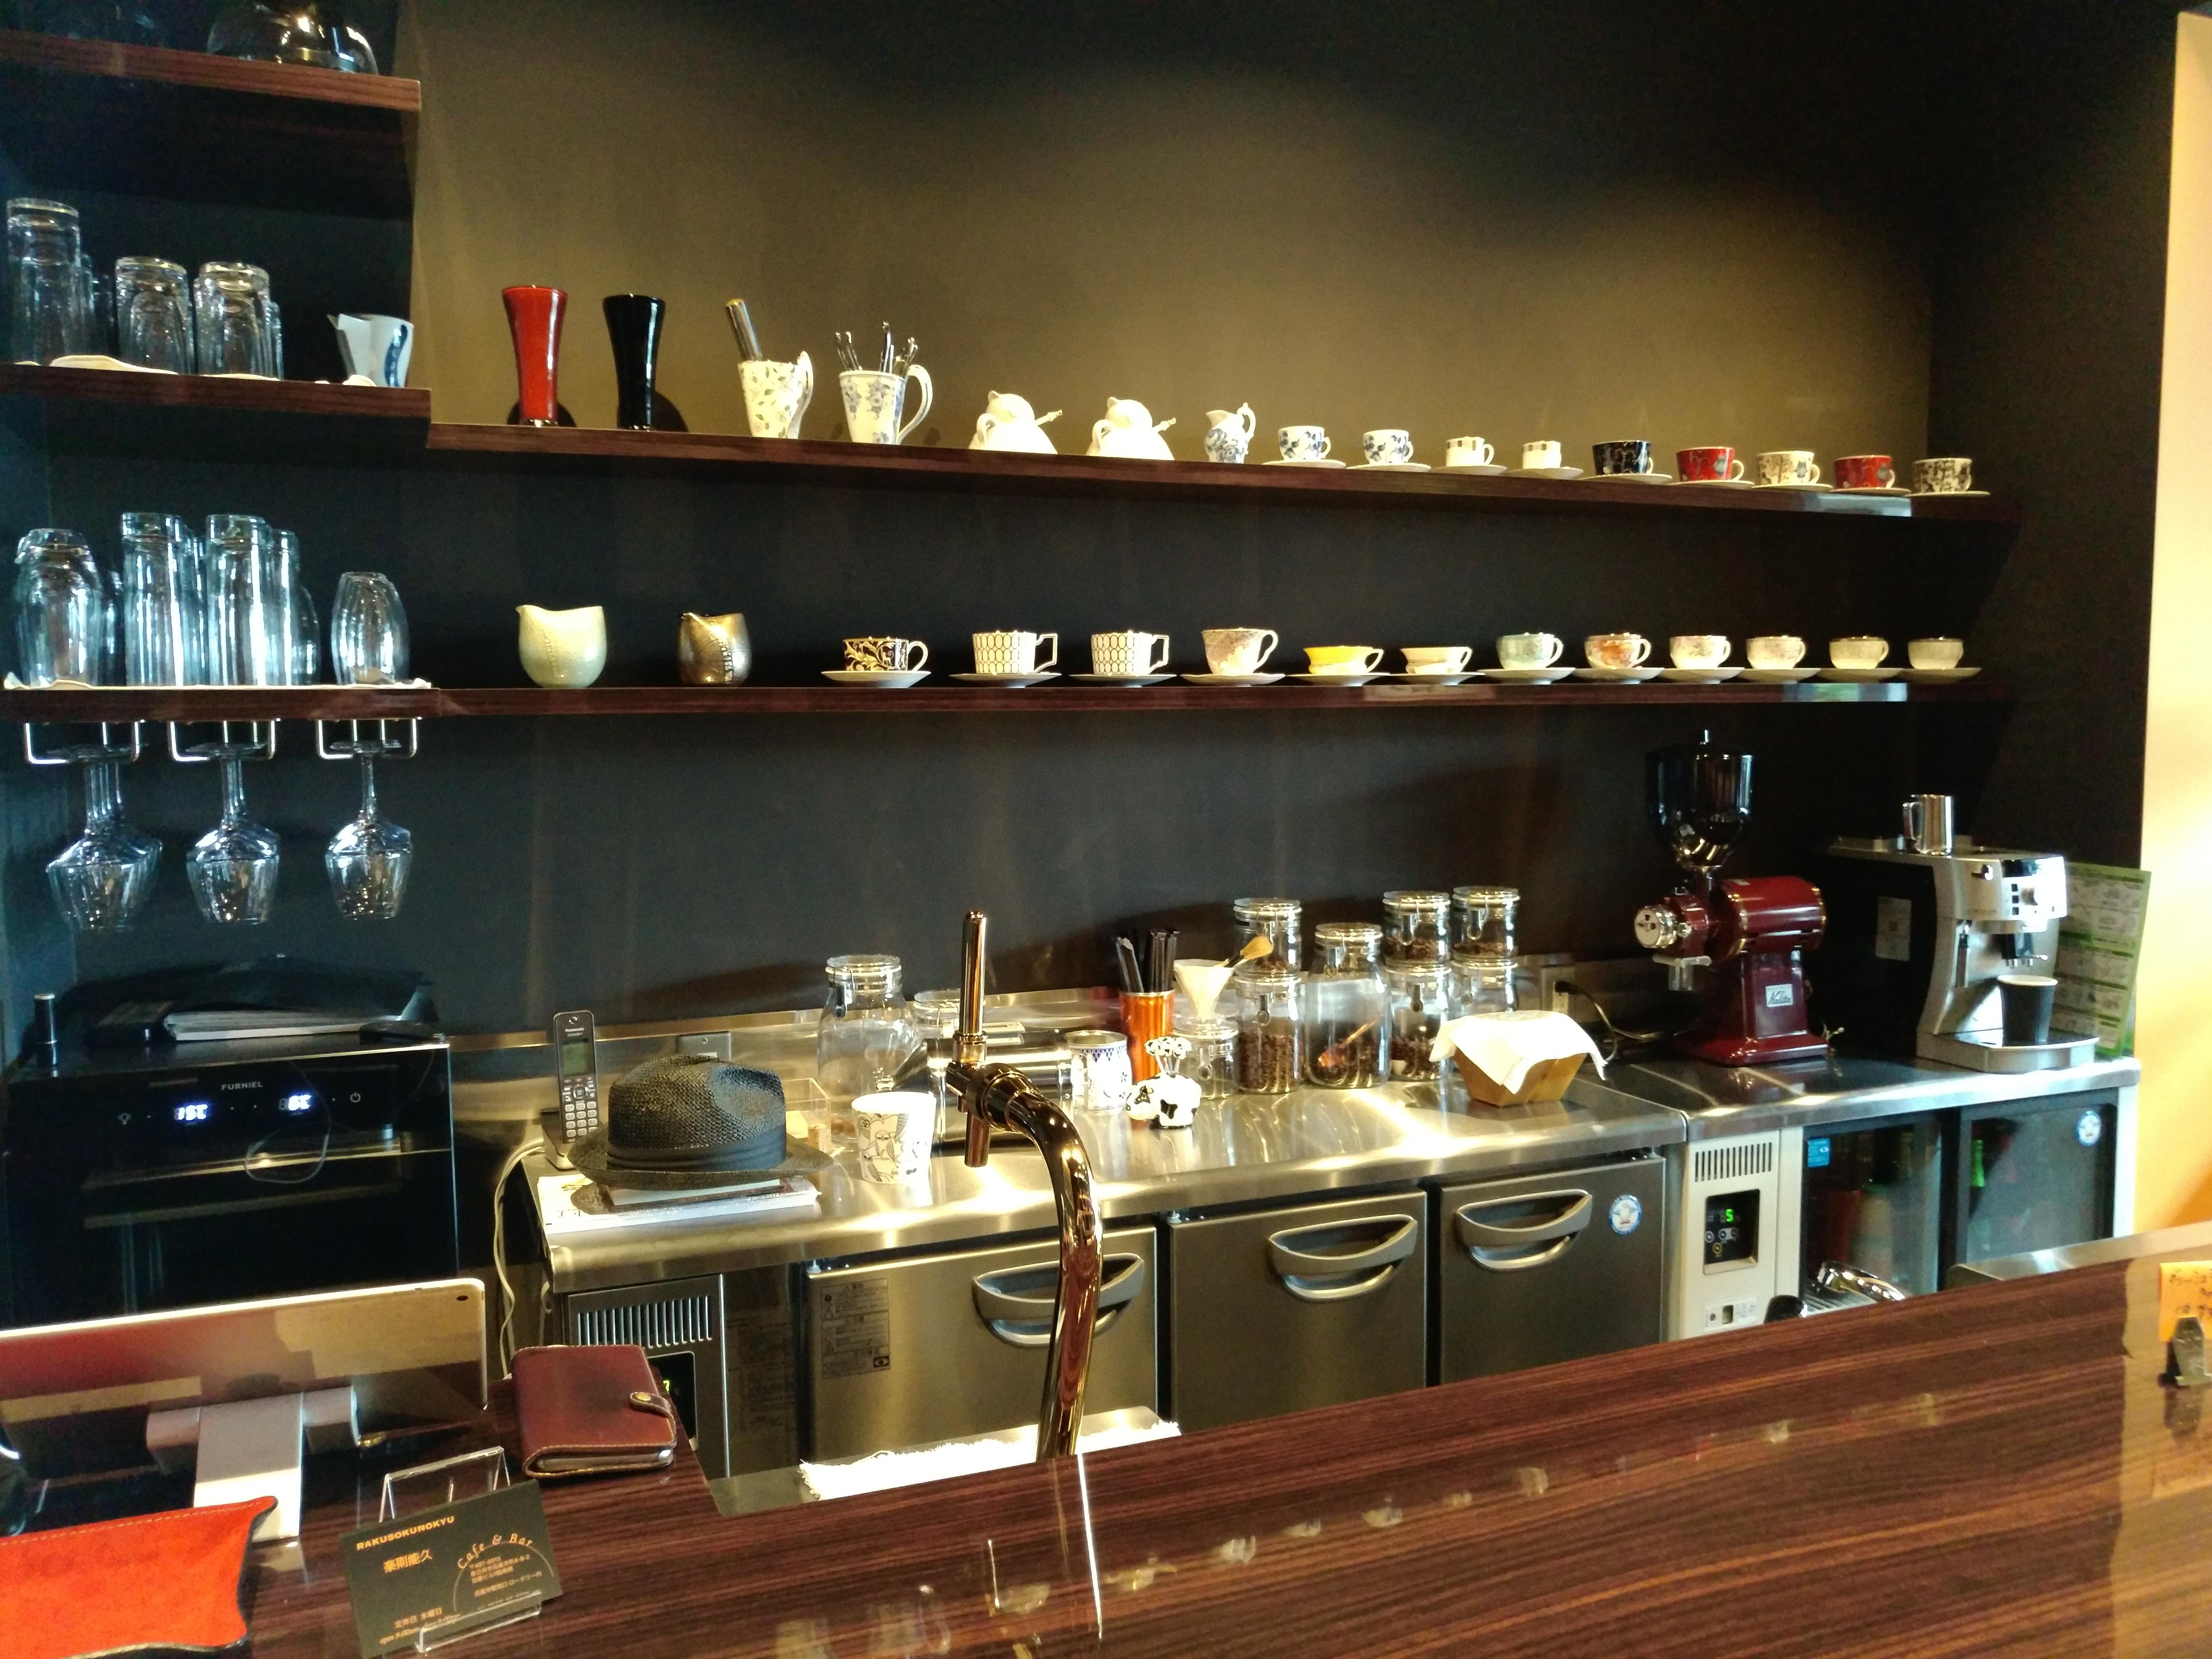 LeTV Leeco Le Max 2を使ってカフェで撮影。拡大すると細部まで捉えている事がわかる